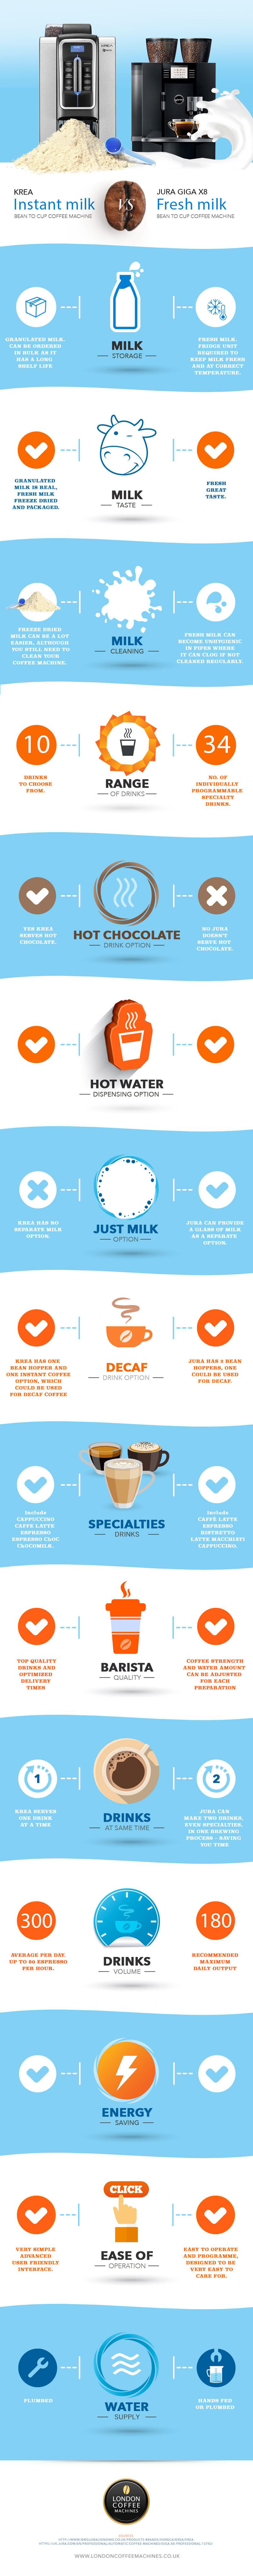 How to Choose the Best Office Coffee Machine: Krea Vs Jura Giga X8 - Infographic